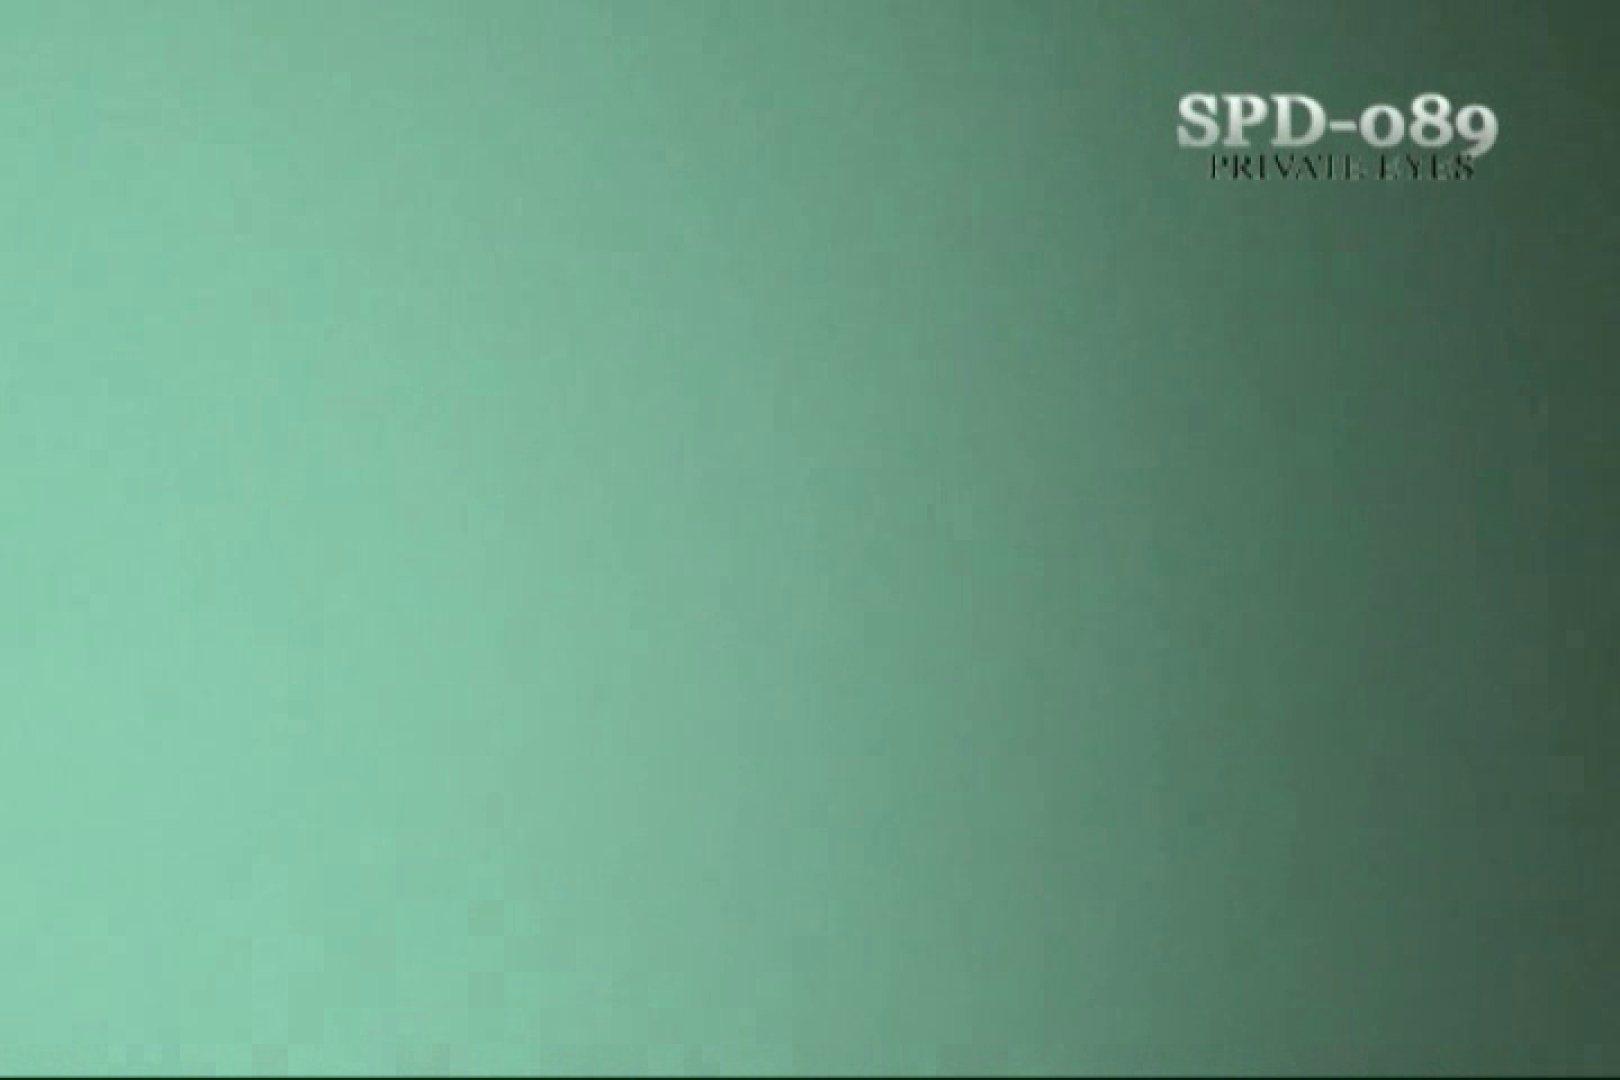 高画質版!SPD-089 厠の隙間 4 厠 濡れ場動画紹介 11pic 10